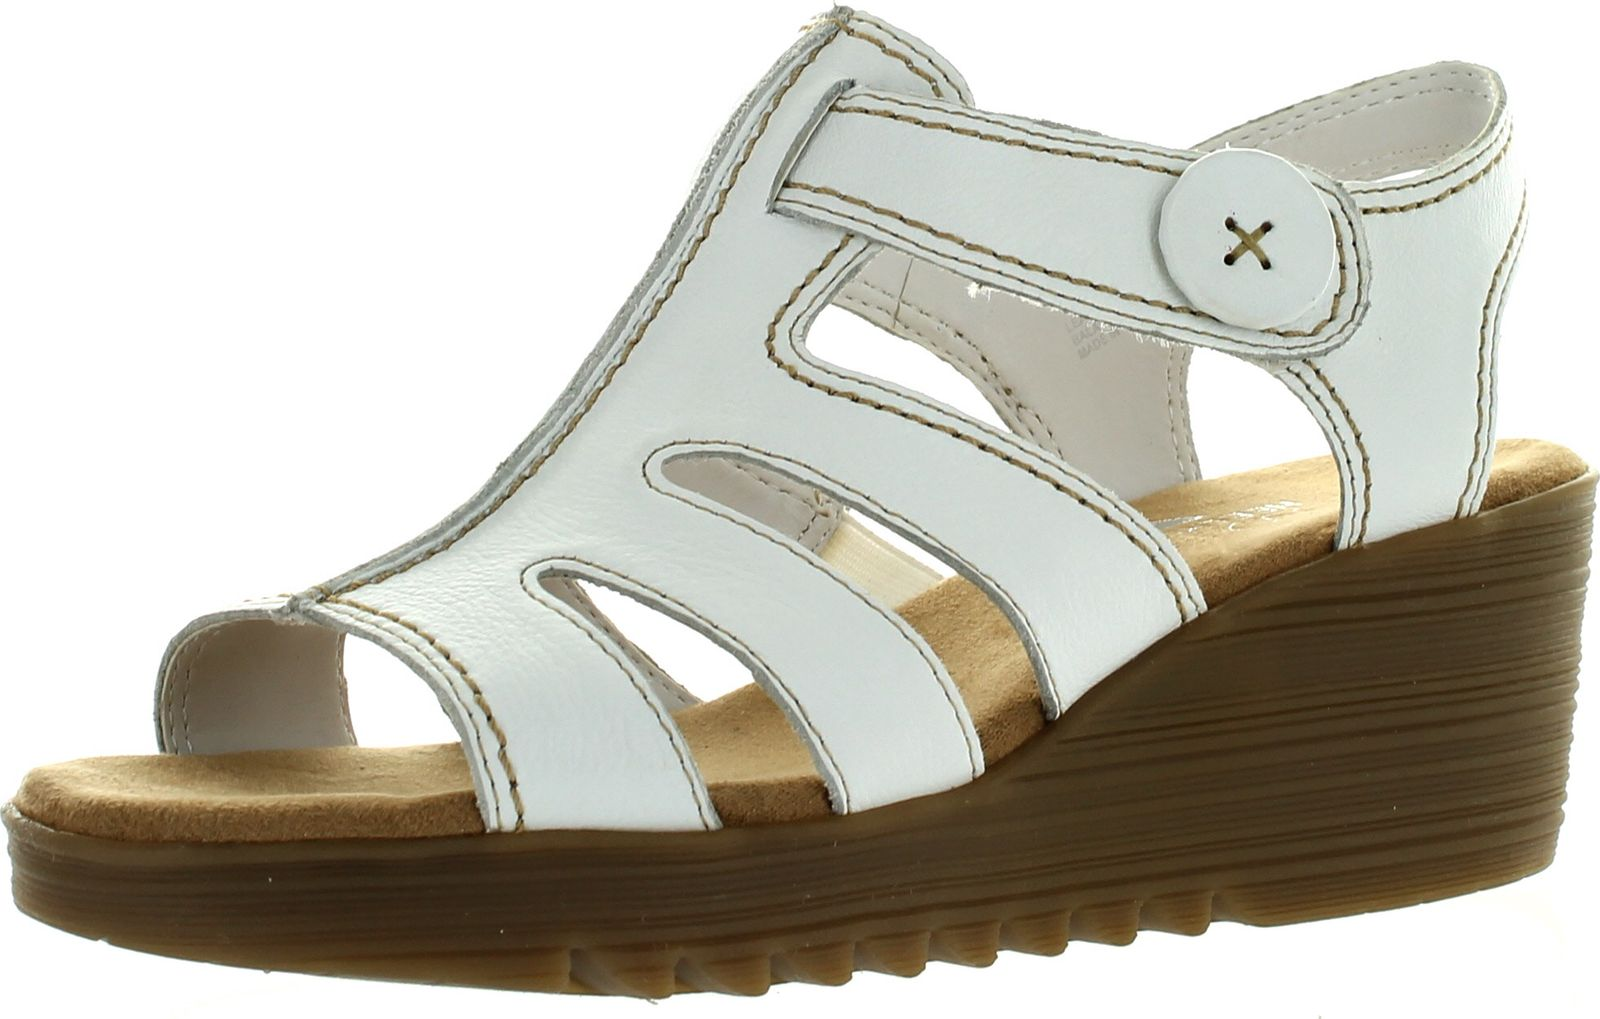 Womens sandals ebay - Aerosoles Shopping Bog Womens Sandals